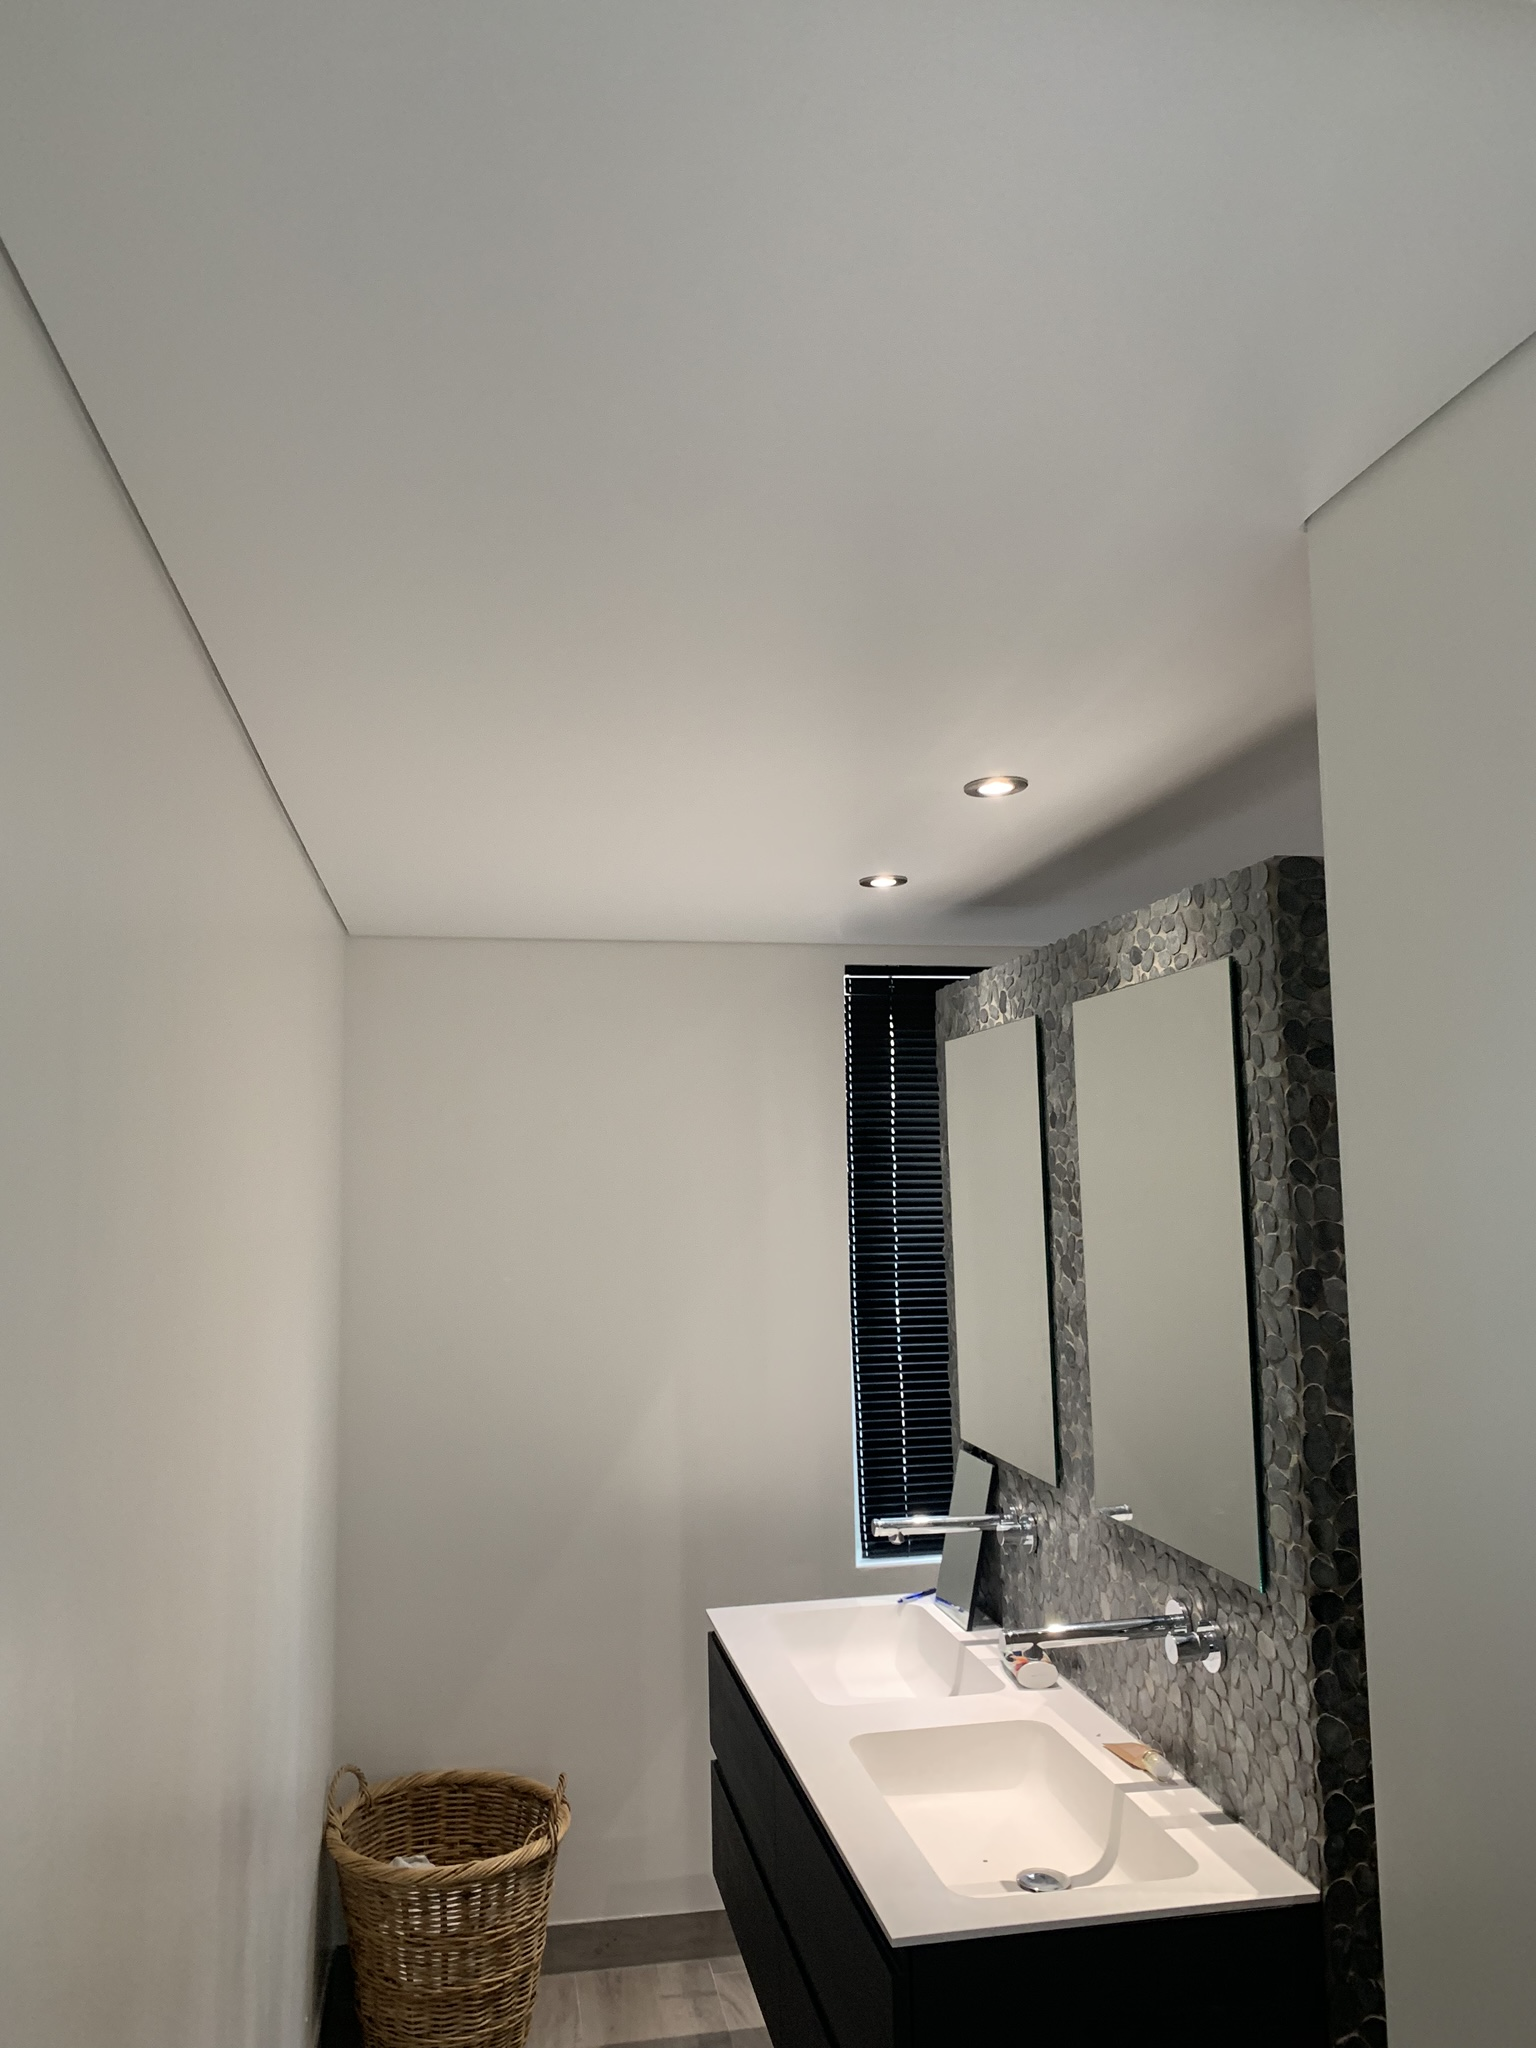 badkamers met een strak afgewerkte spanplafond